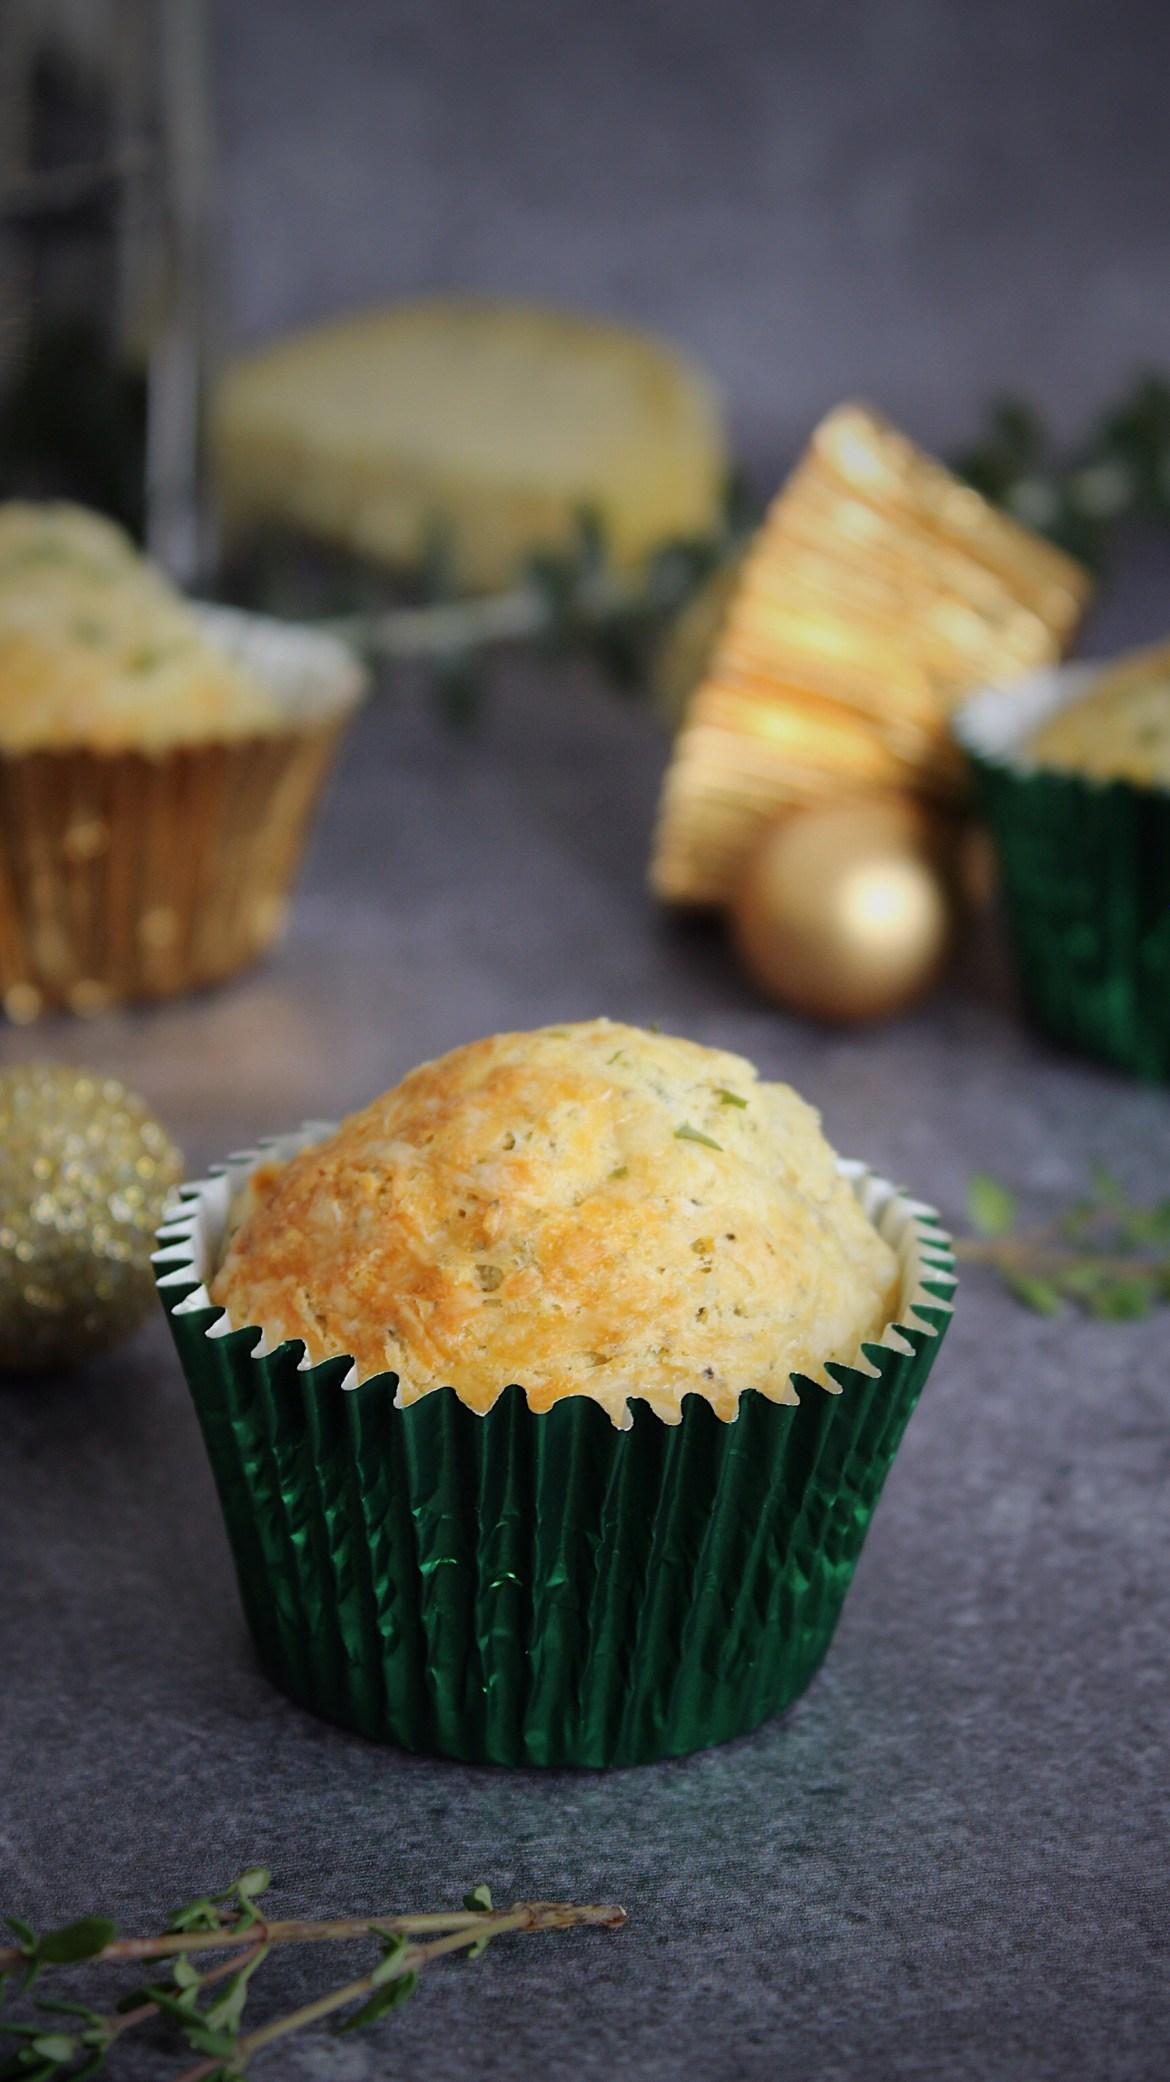 Hartige muffins met kaas en Italiaanse kruiden